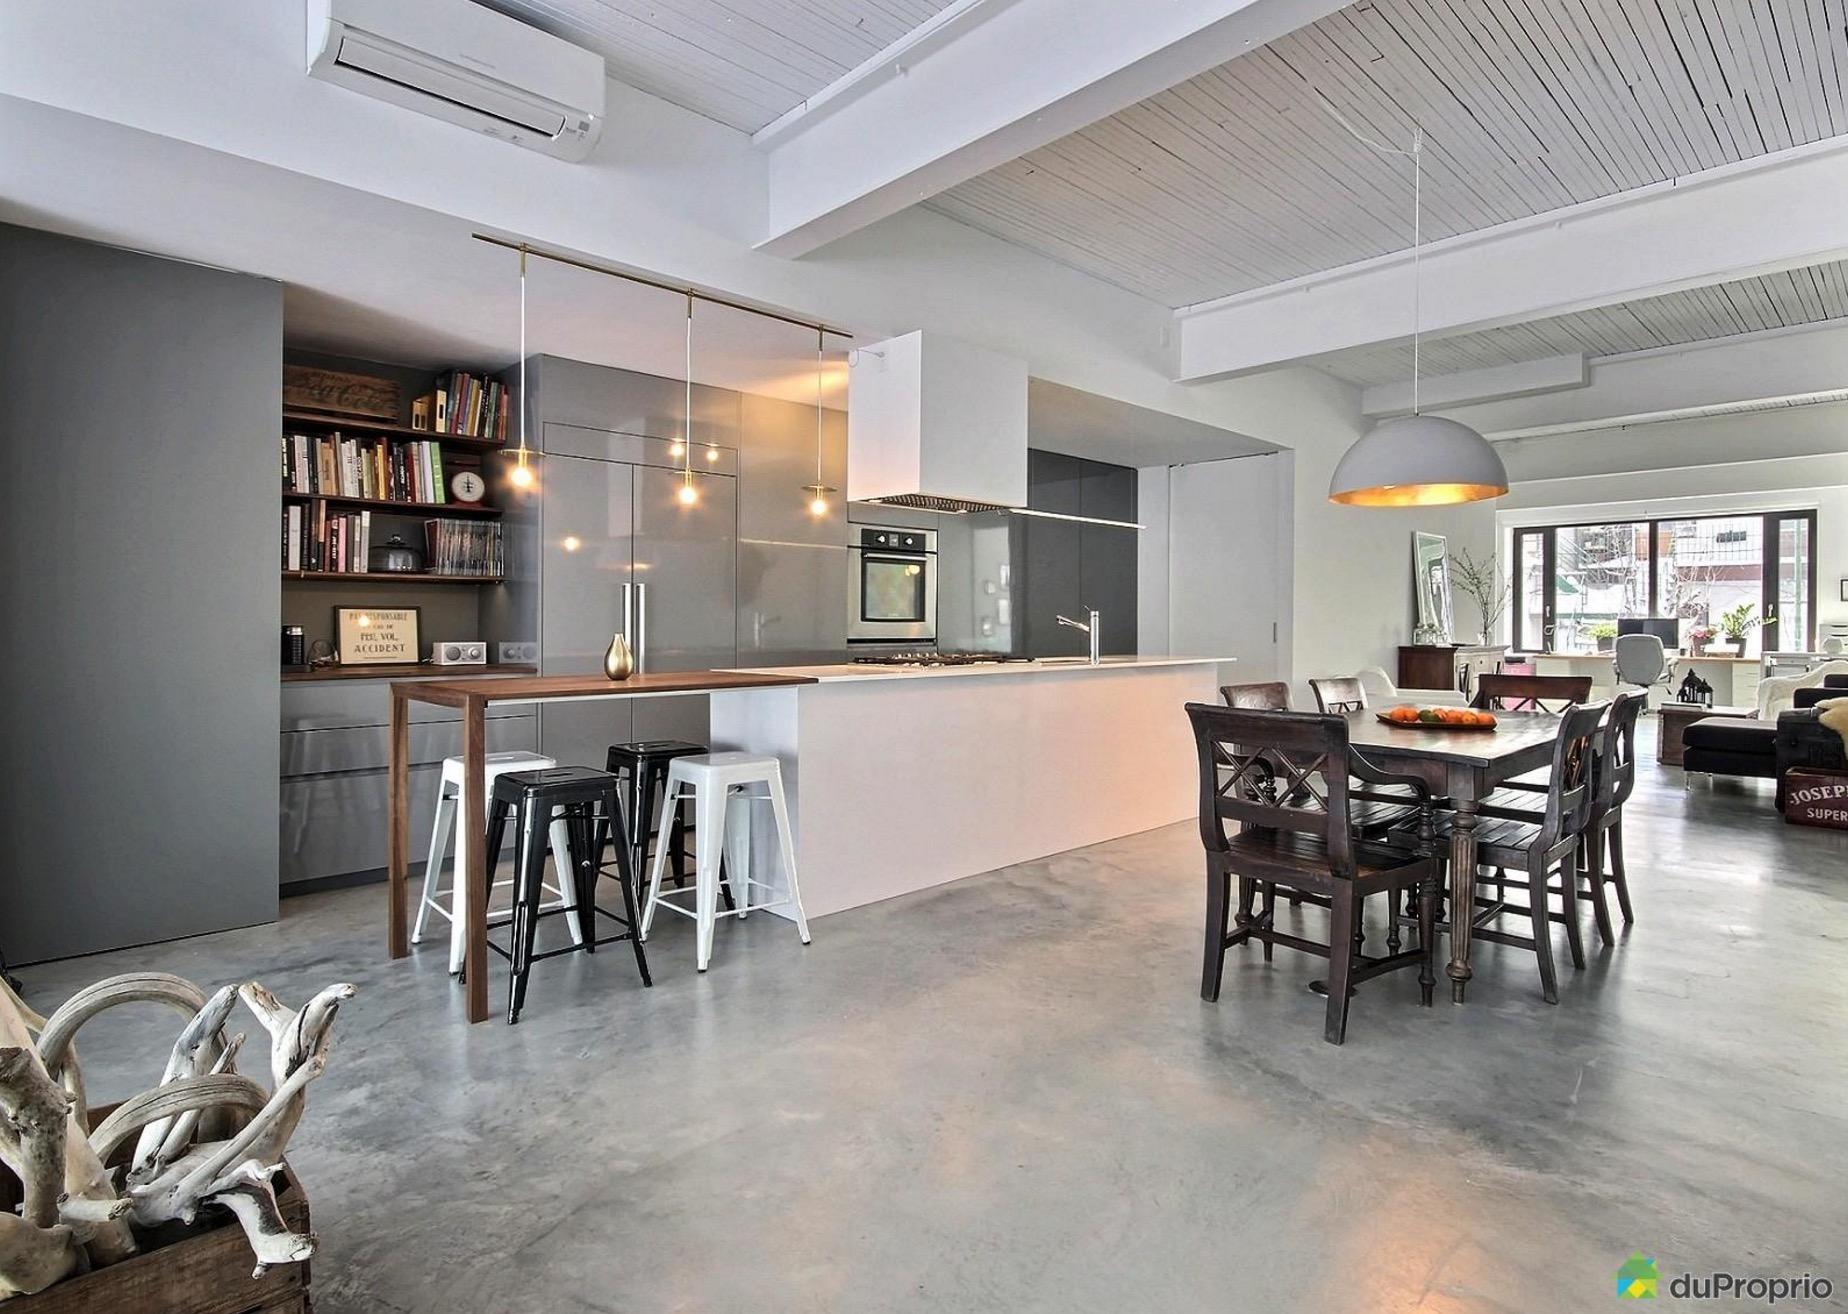 Maison loft a vendre avie home for Maison loft design